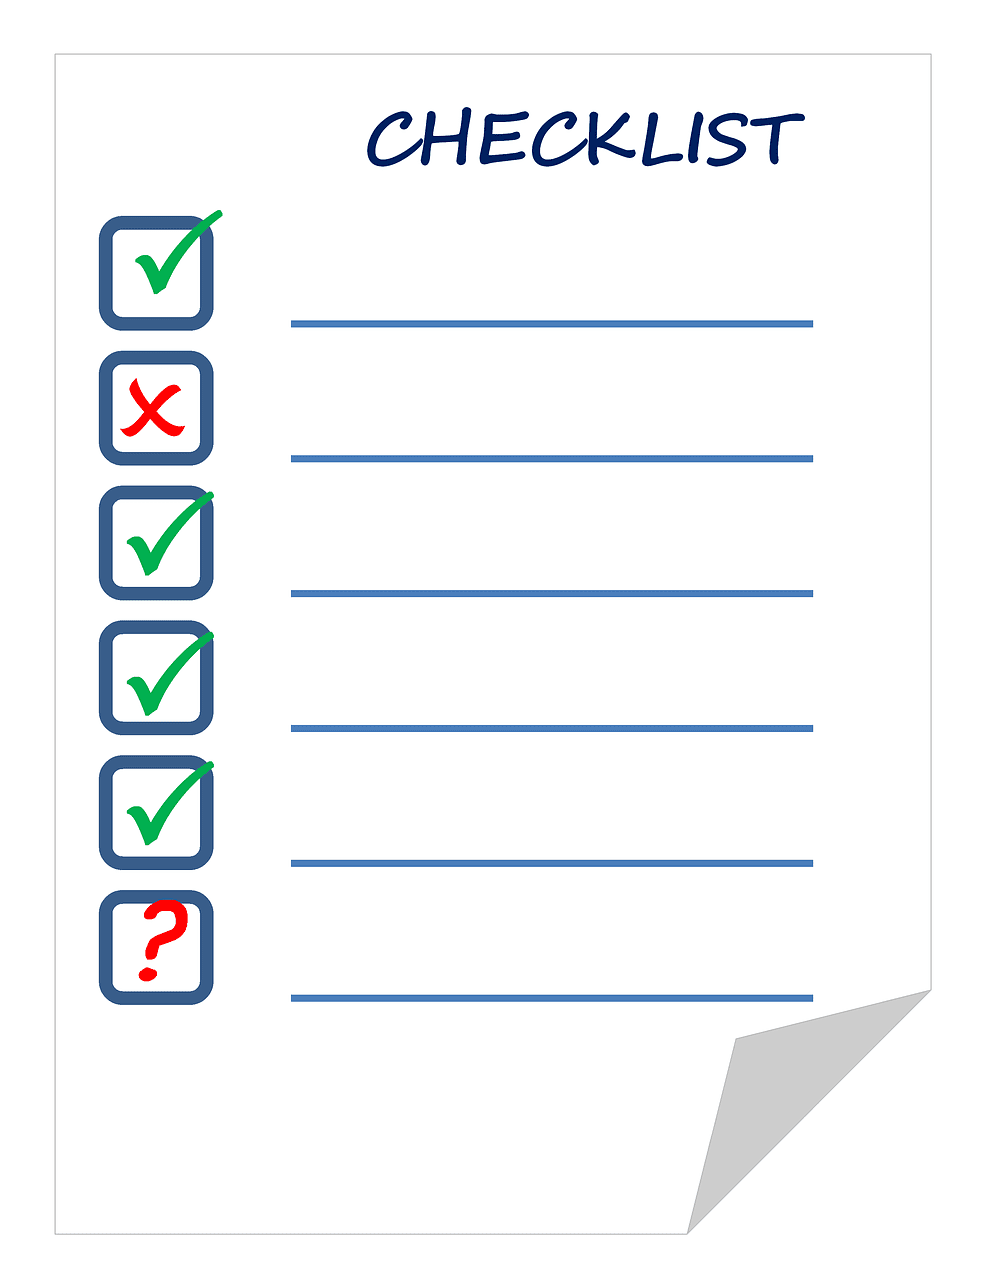 checklist, list, check